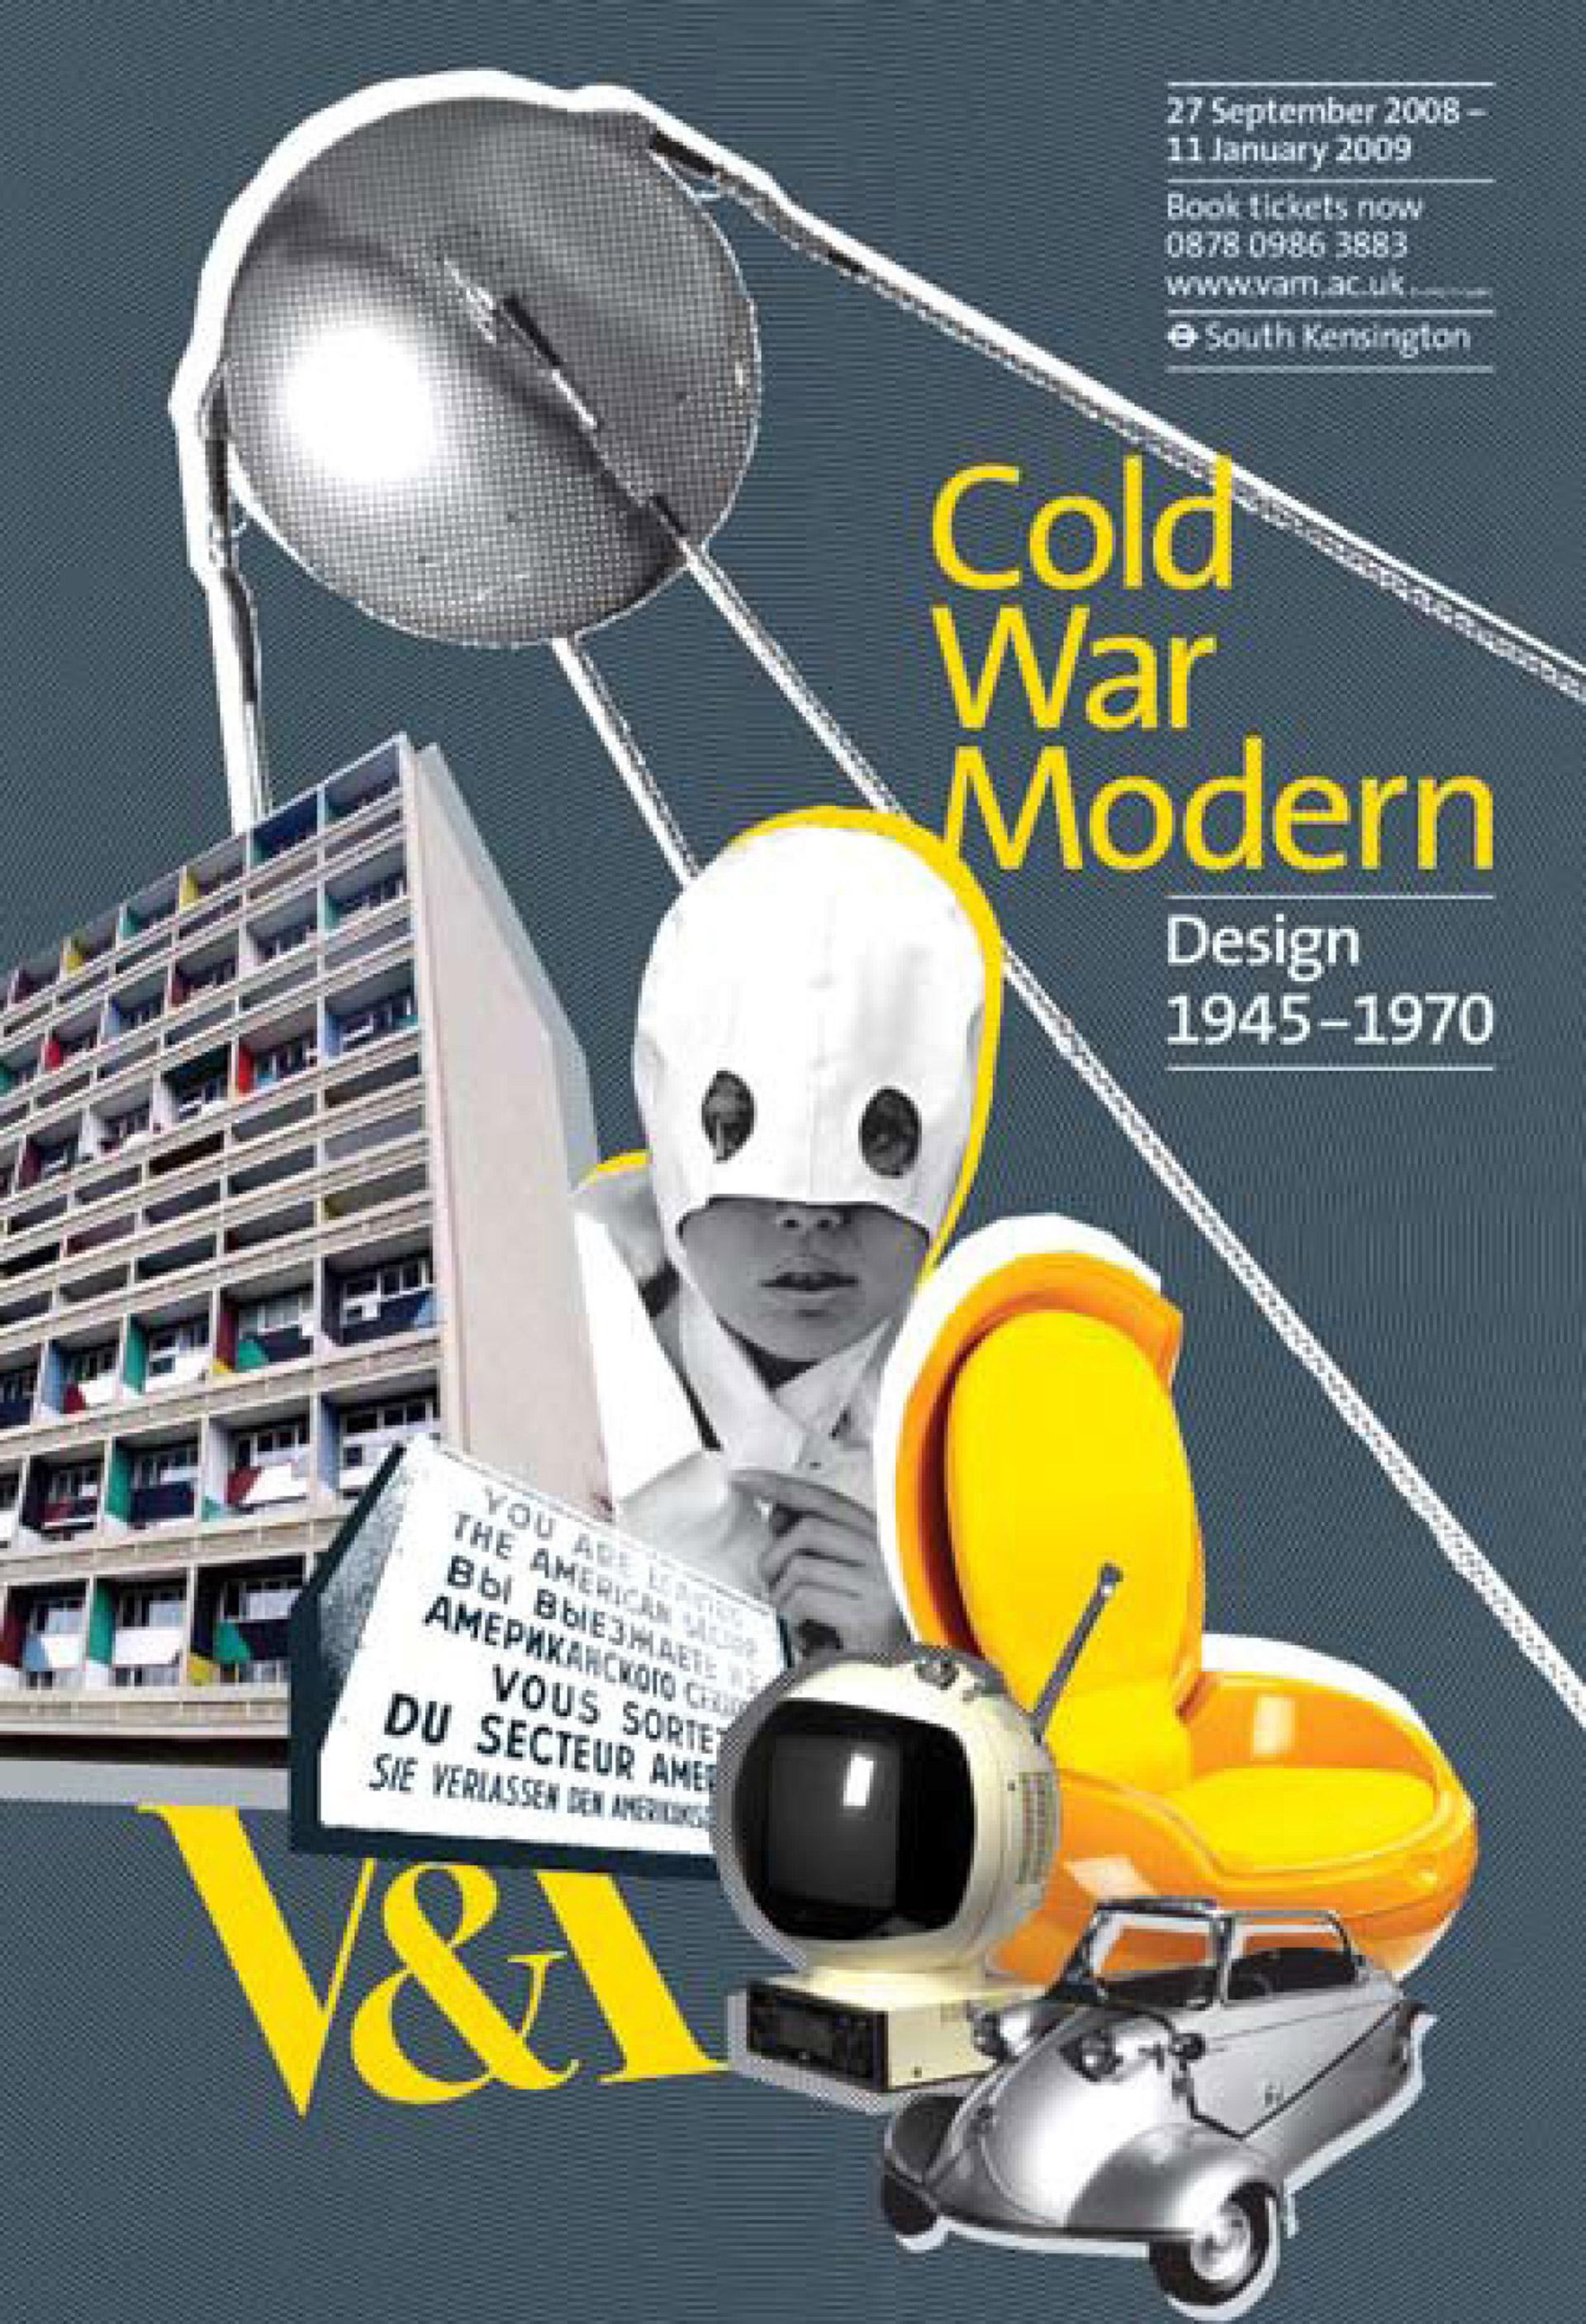 Cold War Modern marketing campaign for V&A South Kensington designed by Irish Butcher